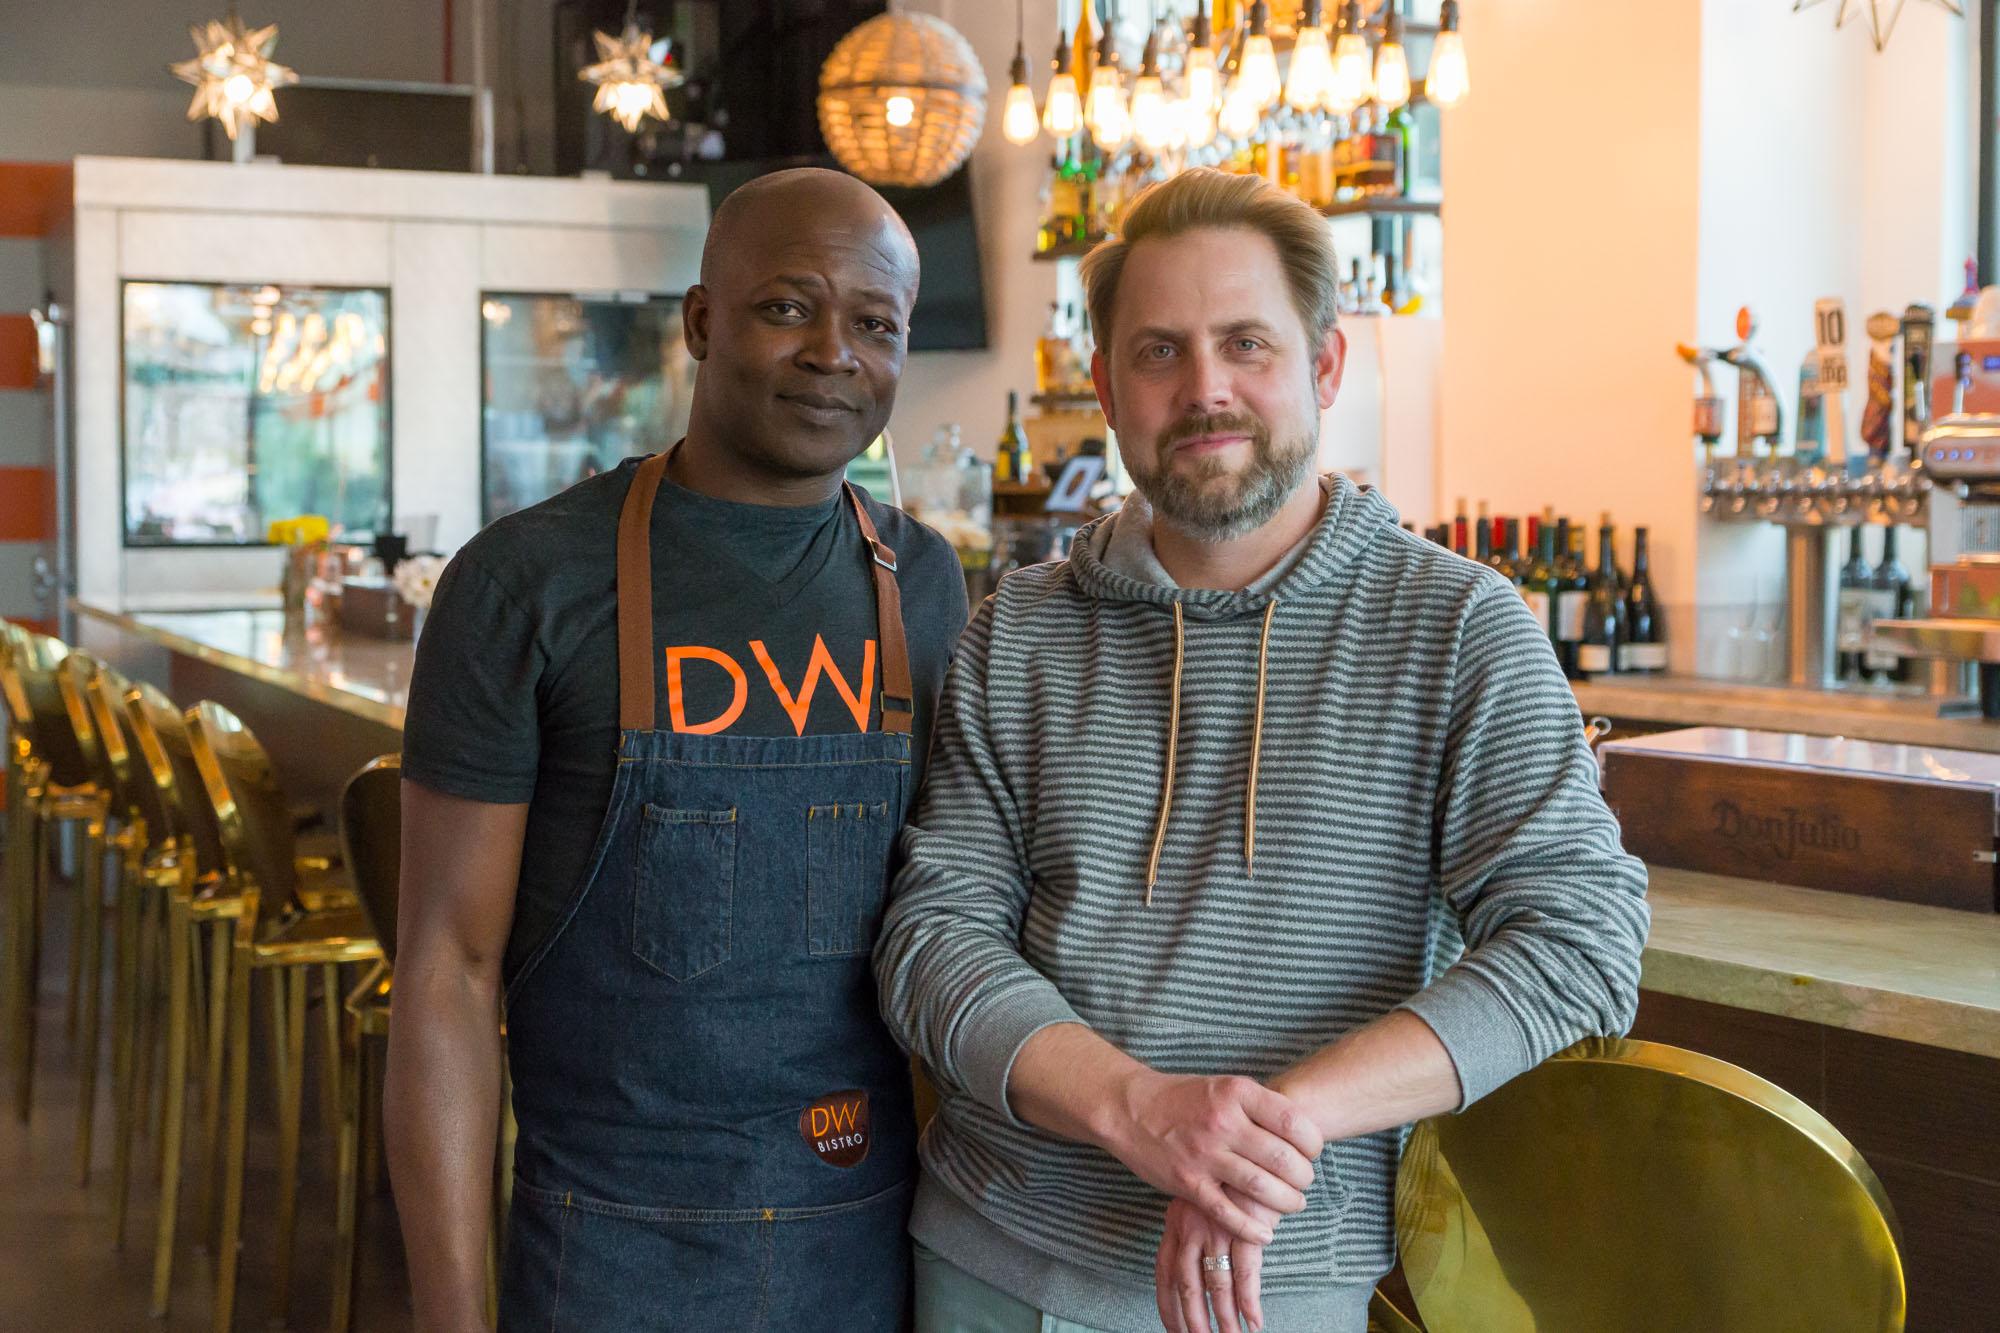 Dalton Wilson and Bryce Krausman at DW Bistro